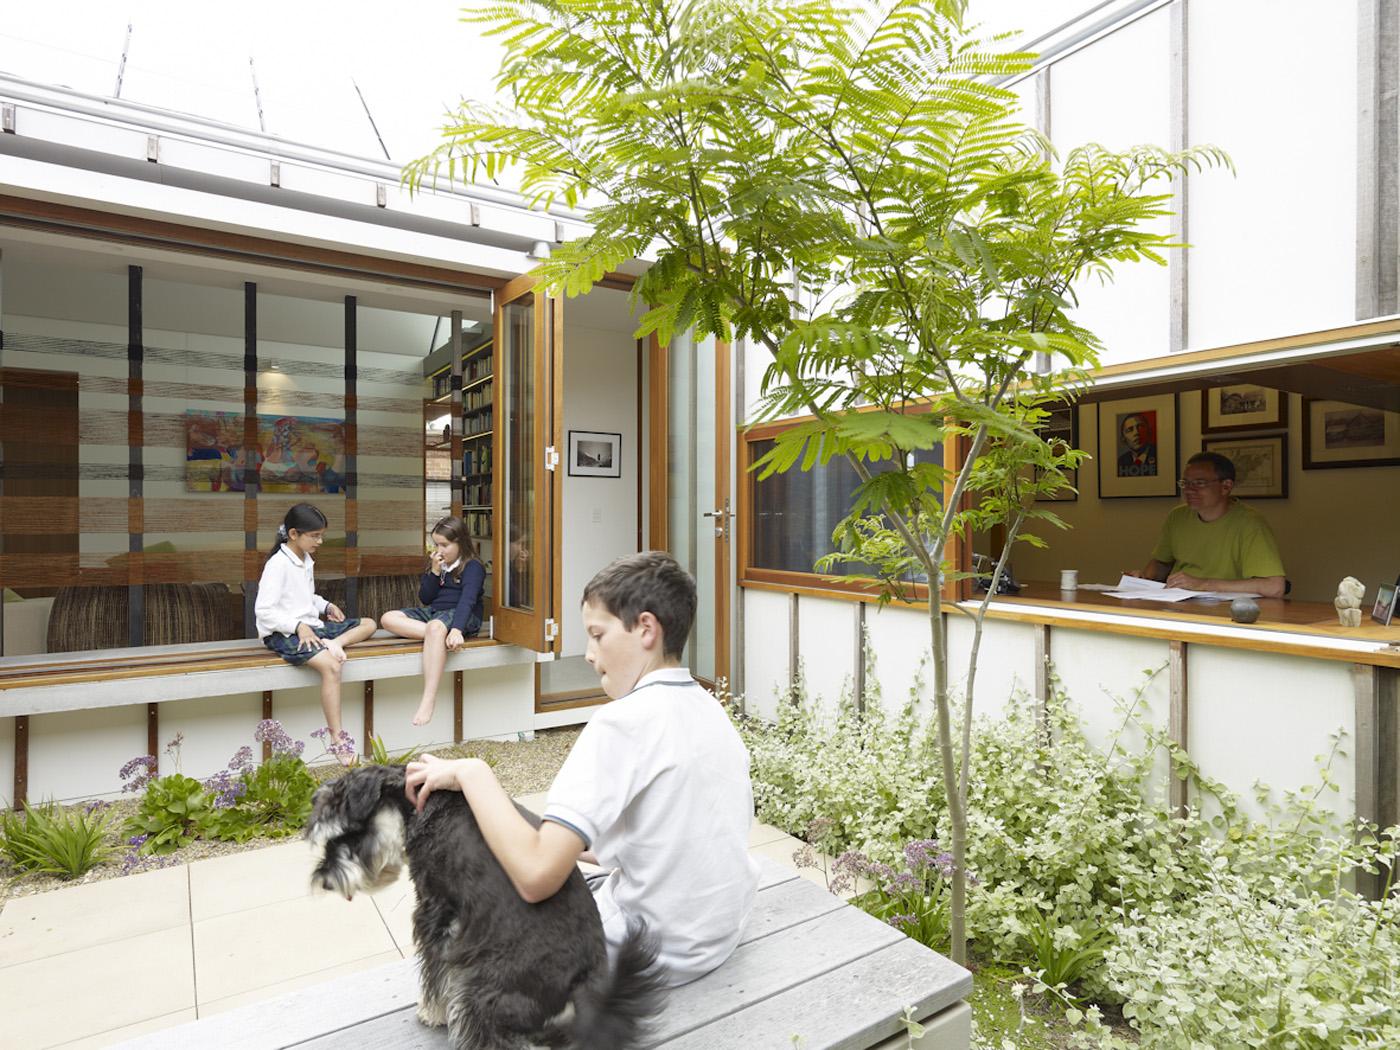 Garrett House by Sydney award winning architecture office Sam Crawford Architects. Children playing in internal courtyard